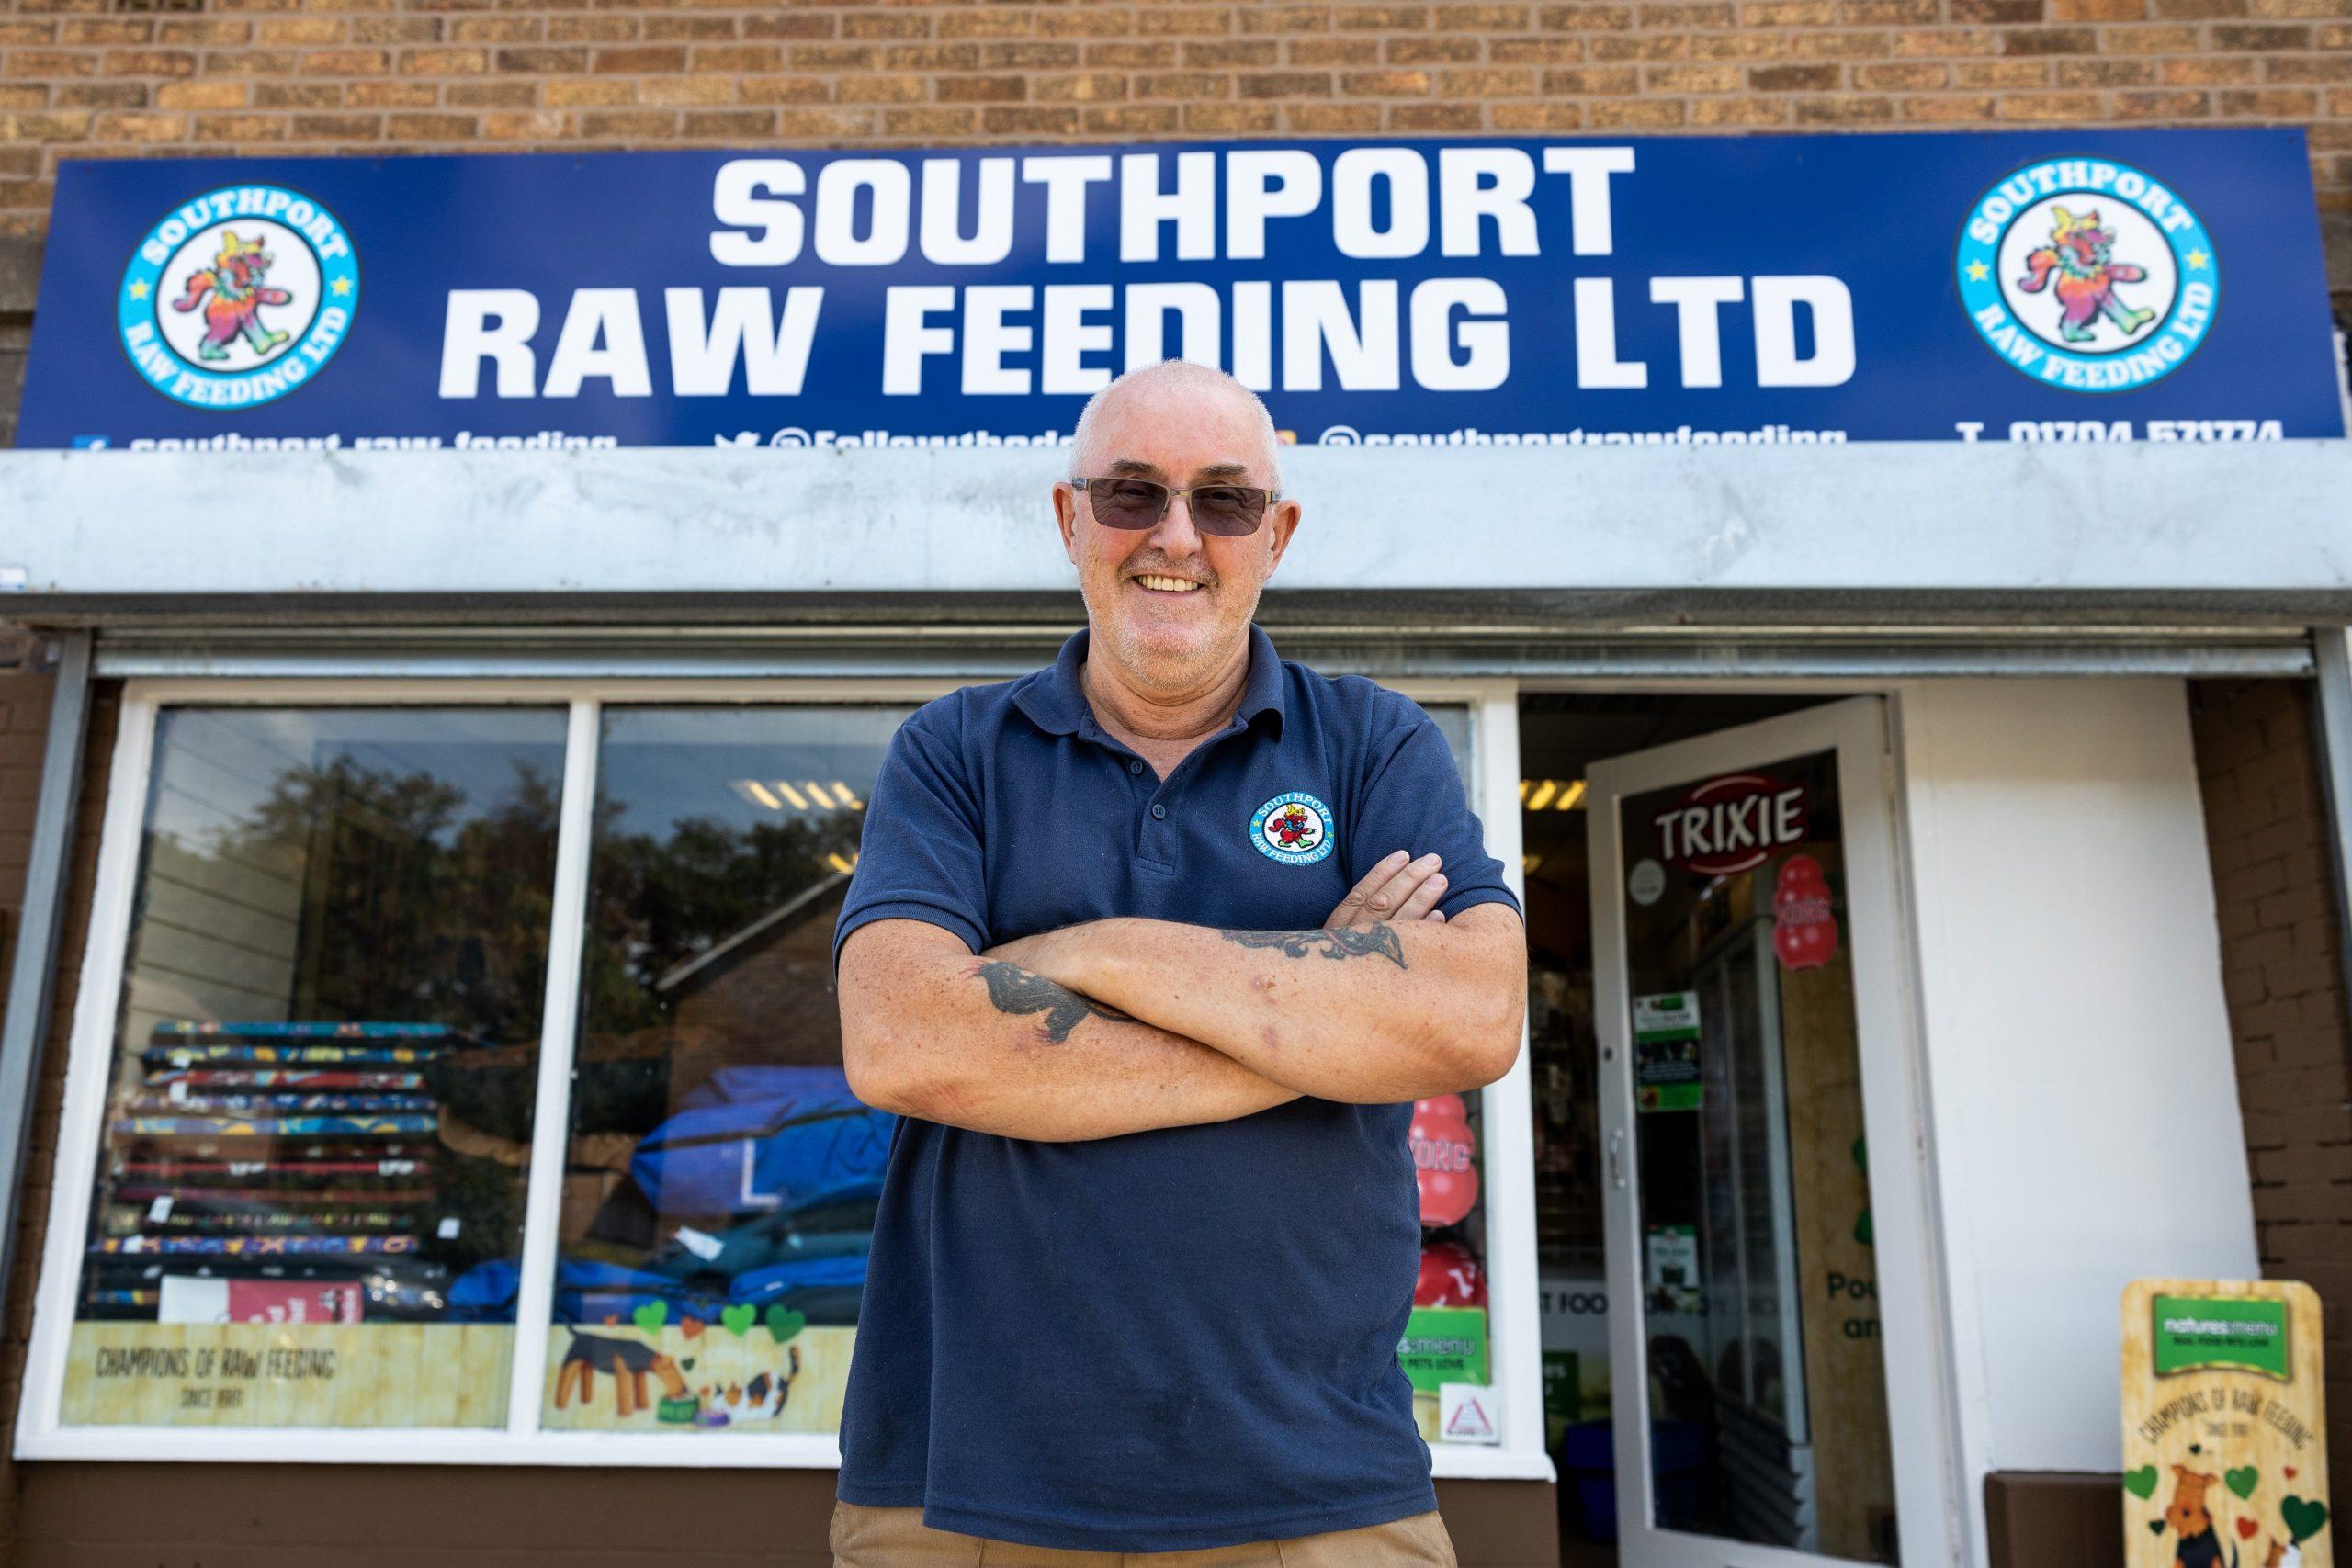 Southport Raw Feeding 199 Heathfield Rd, Ainsdale, Southport PR8 3HE